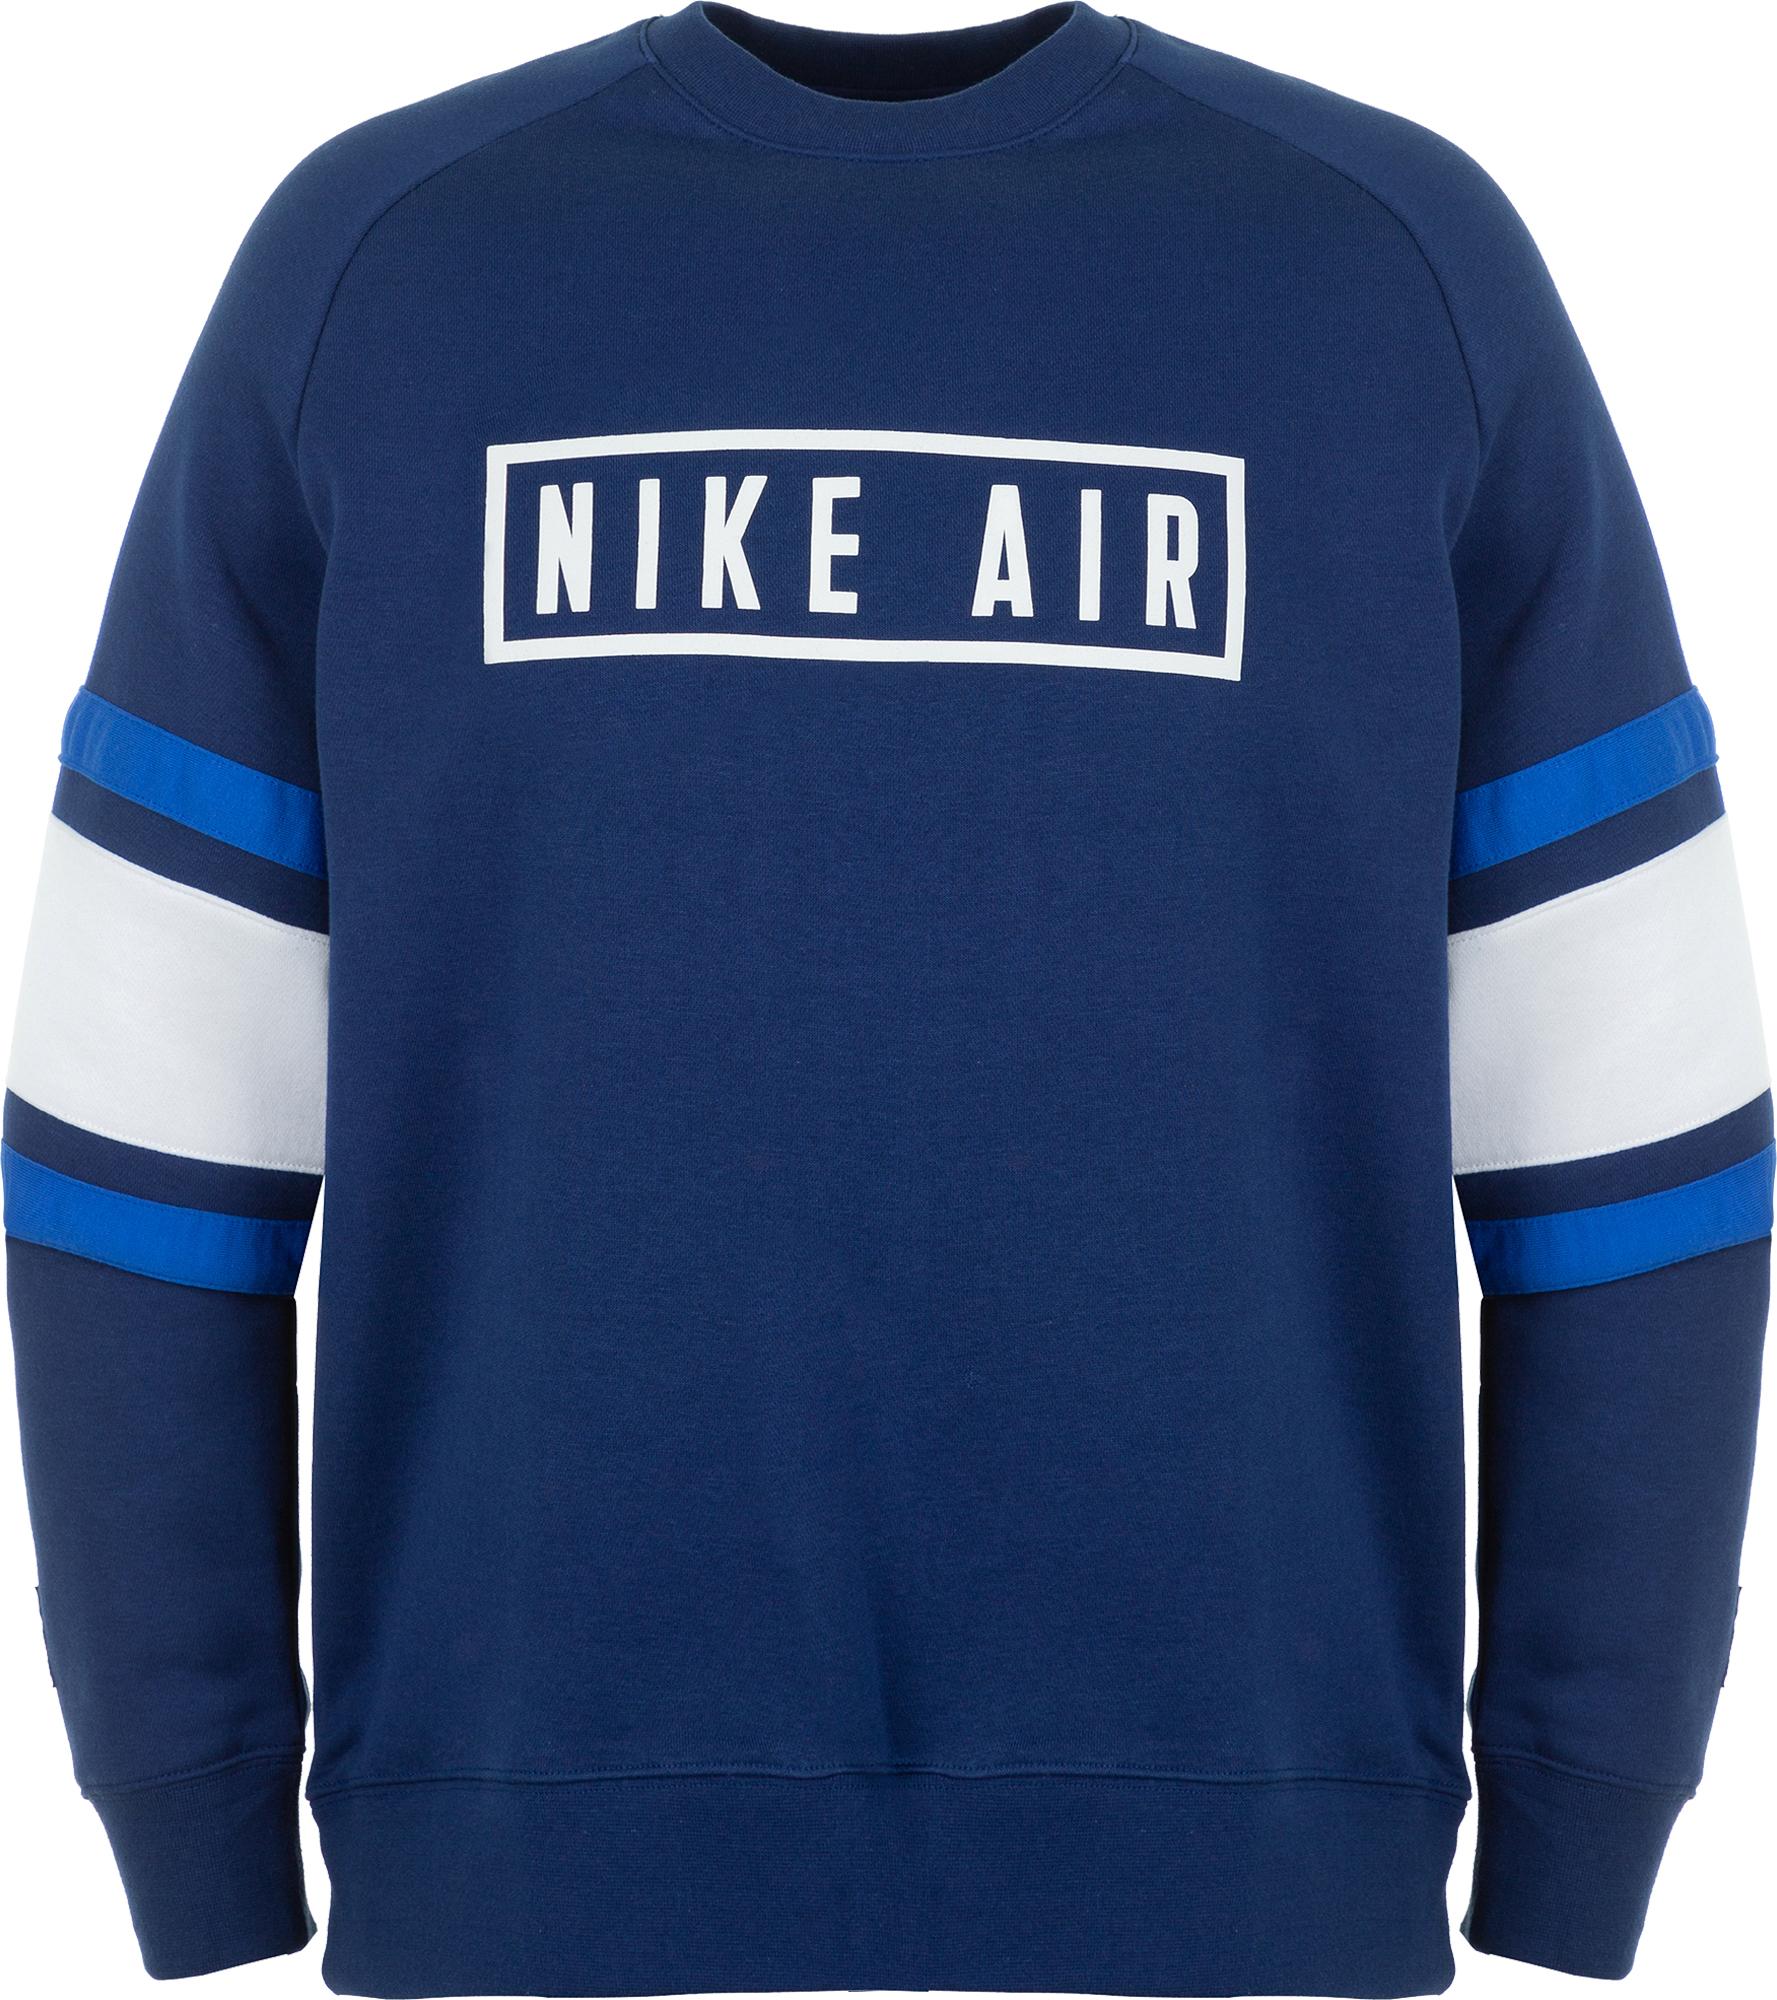 Nike Свитшот мужской Nike Air Crew, размер 52-54